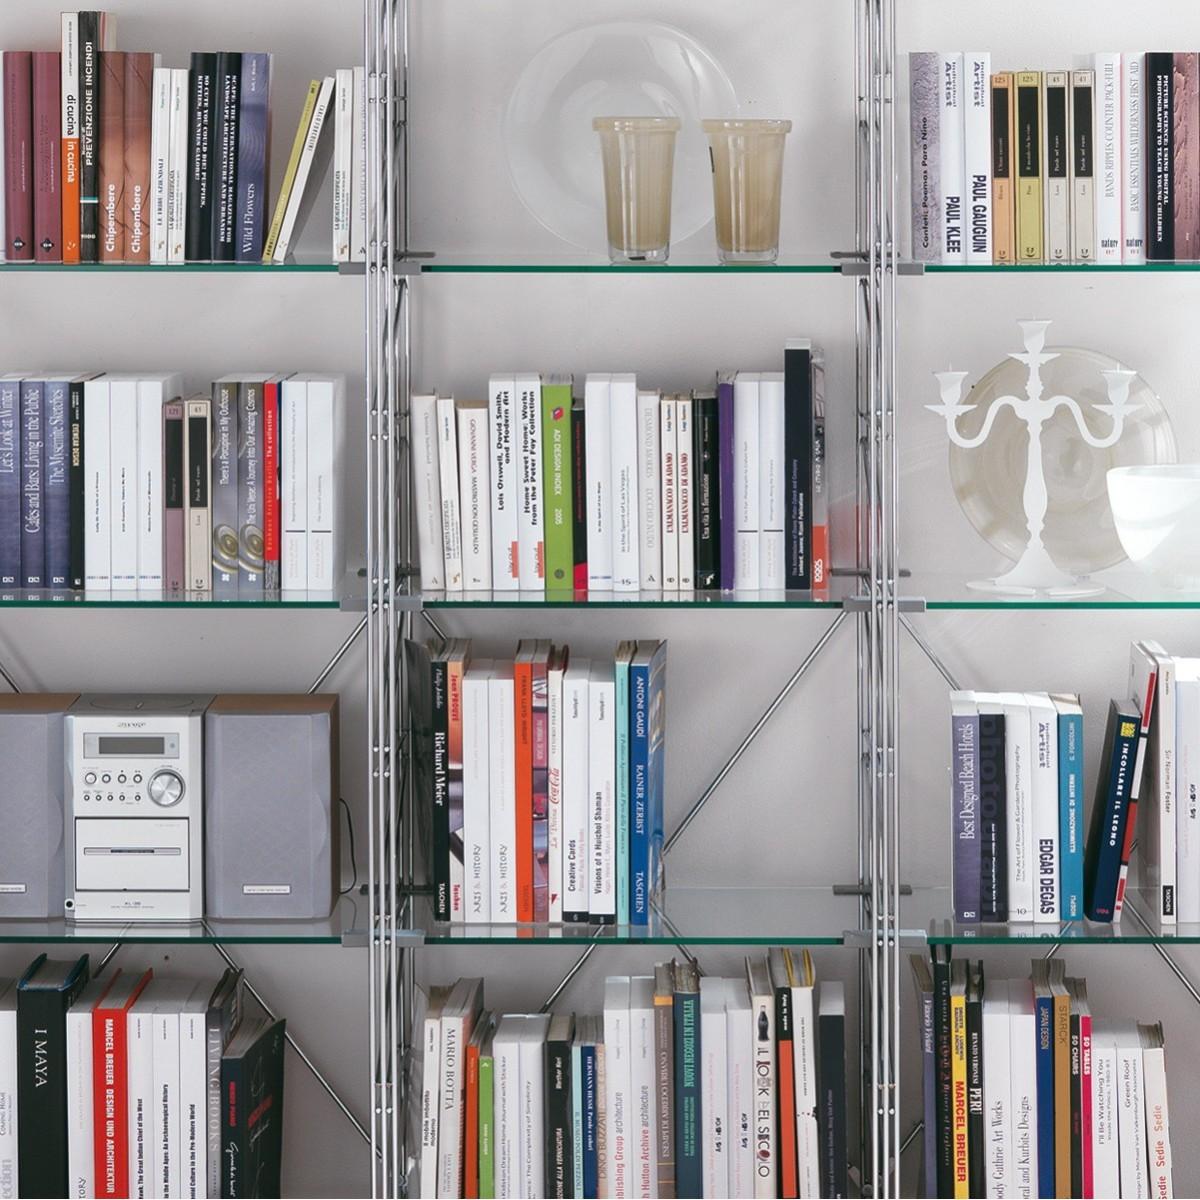 Libreria Metallo E Vetro.Libreria Per Mansarda In Acciaio E Vetro Design Moderno Socrate 43